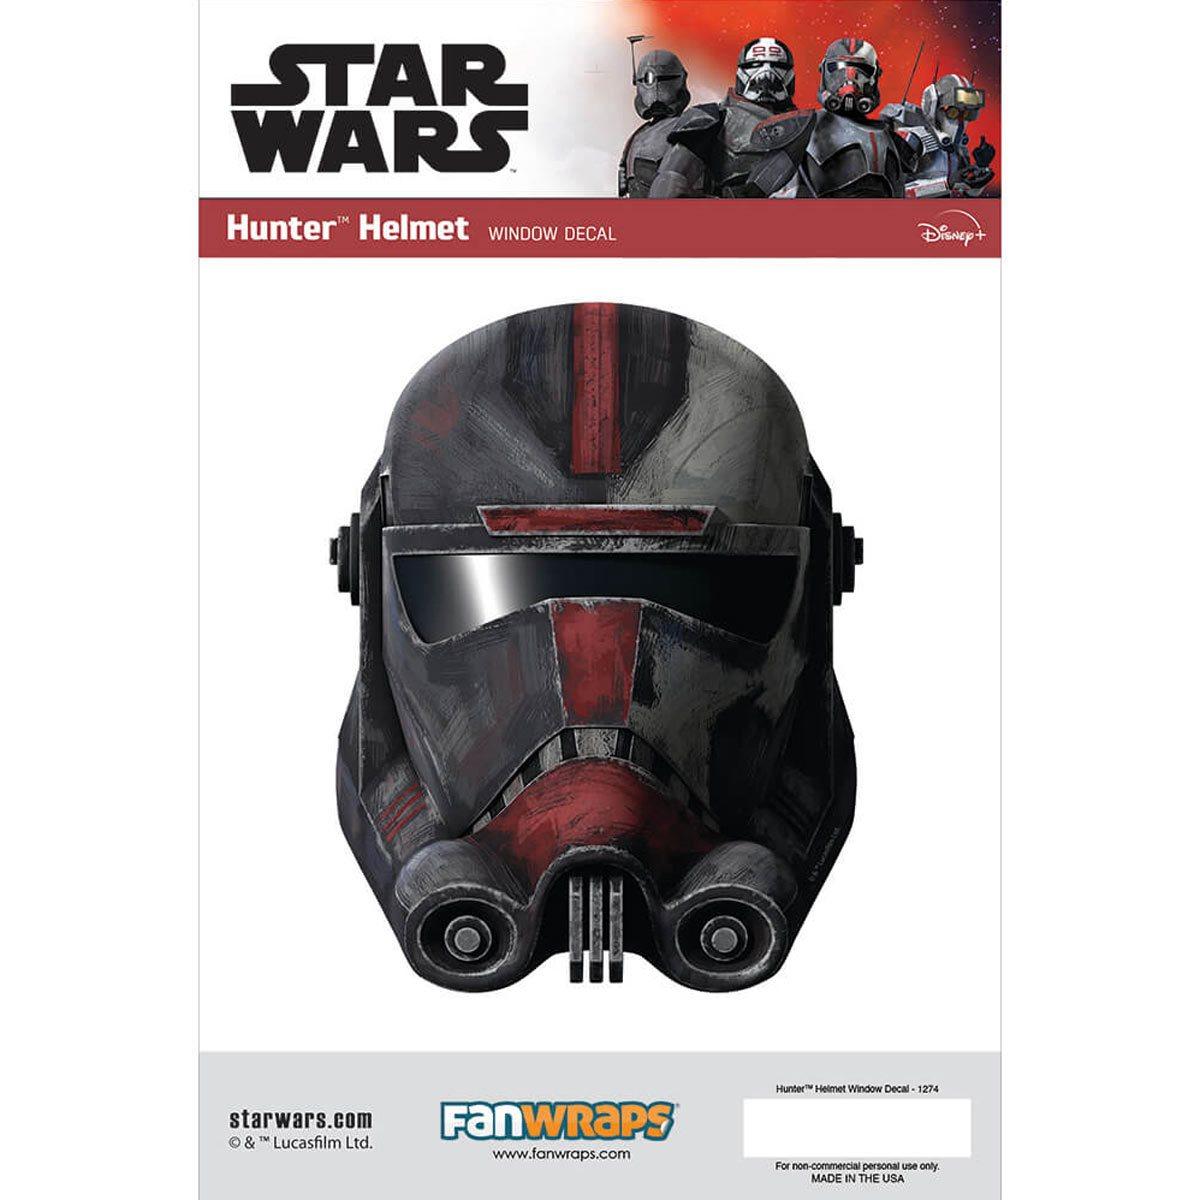 Star Wars Hunter Helmet Window Decal画像